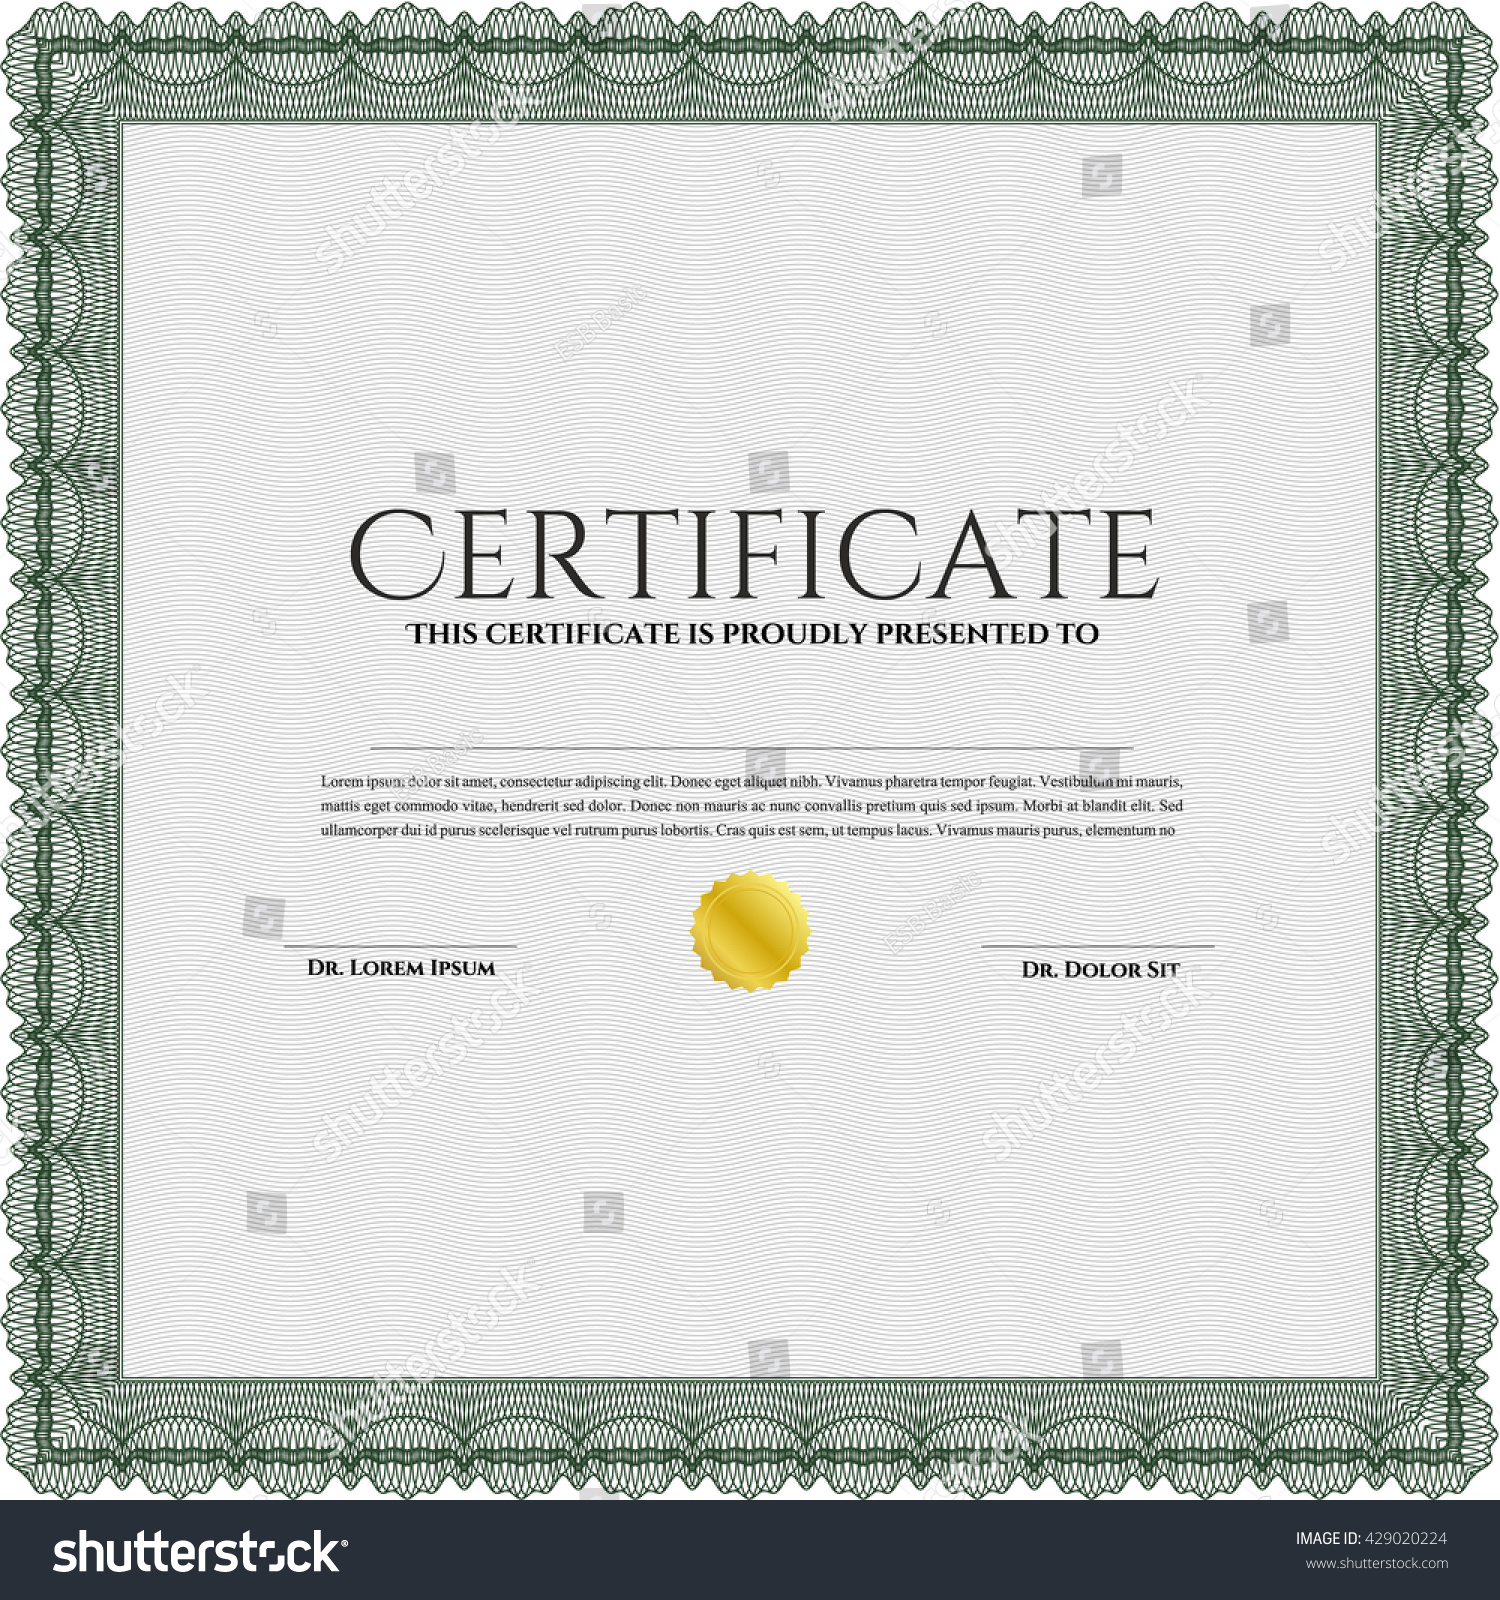 Certificate Diploma Template Good Design Border Stock Vector